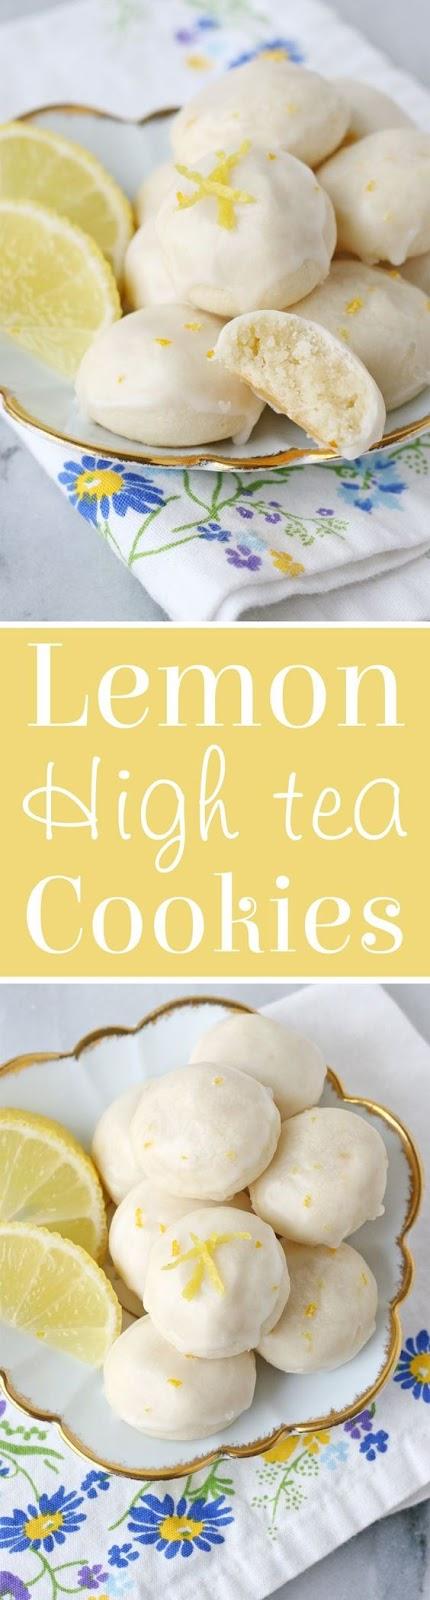 Lemon High Tea Cookies